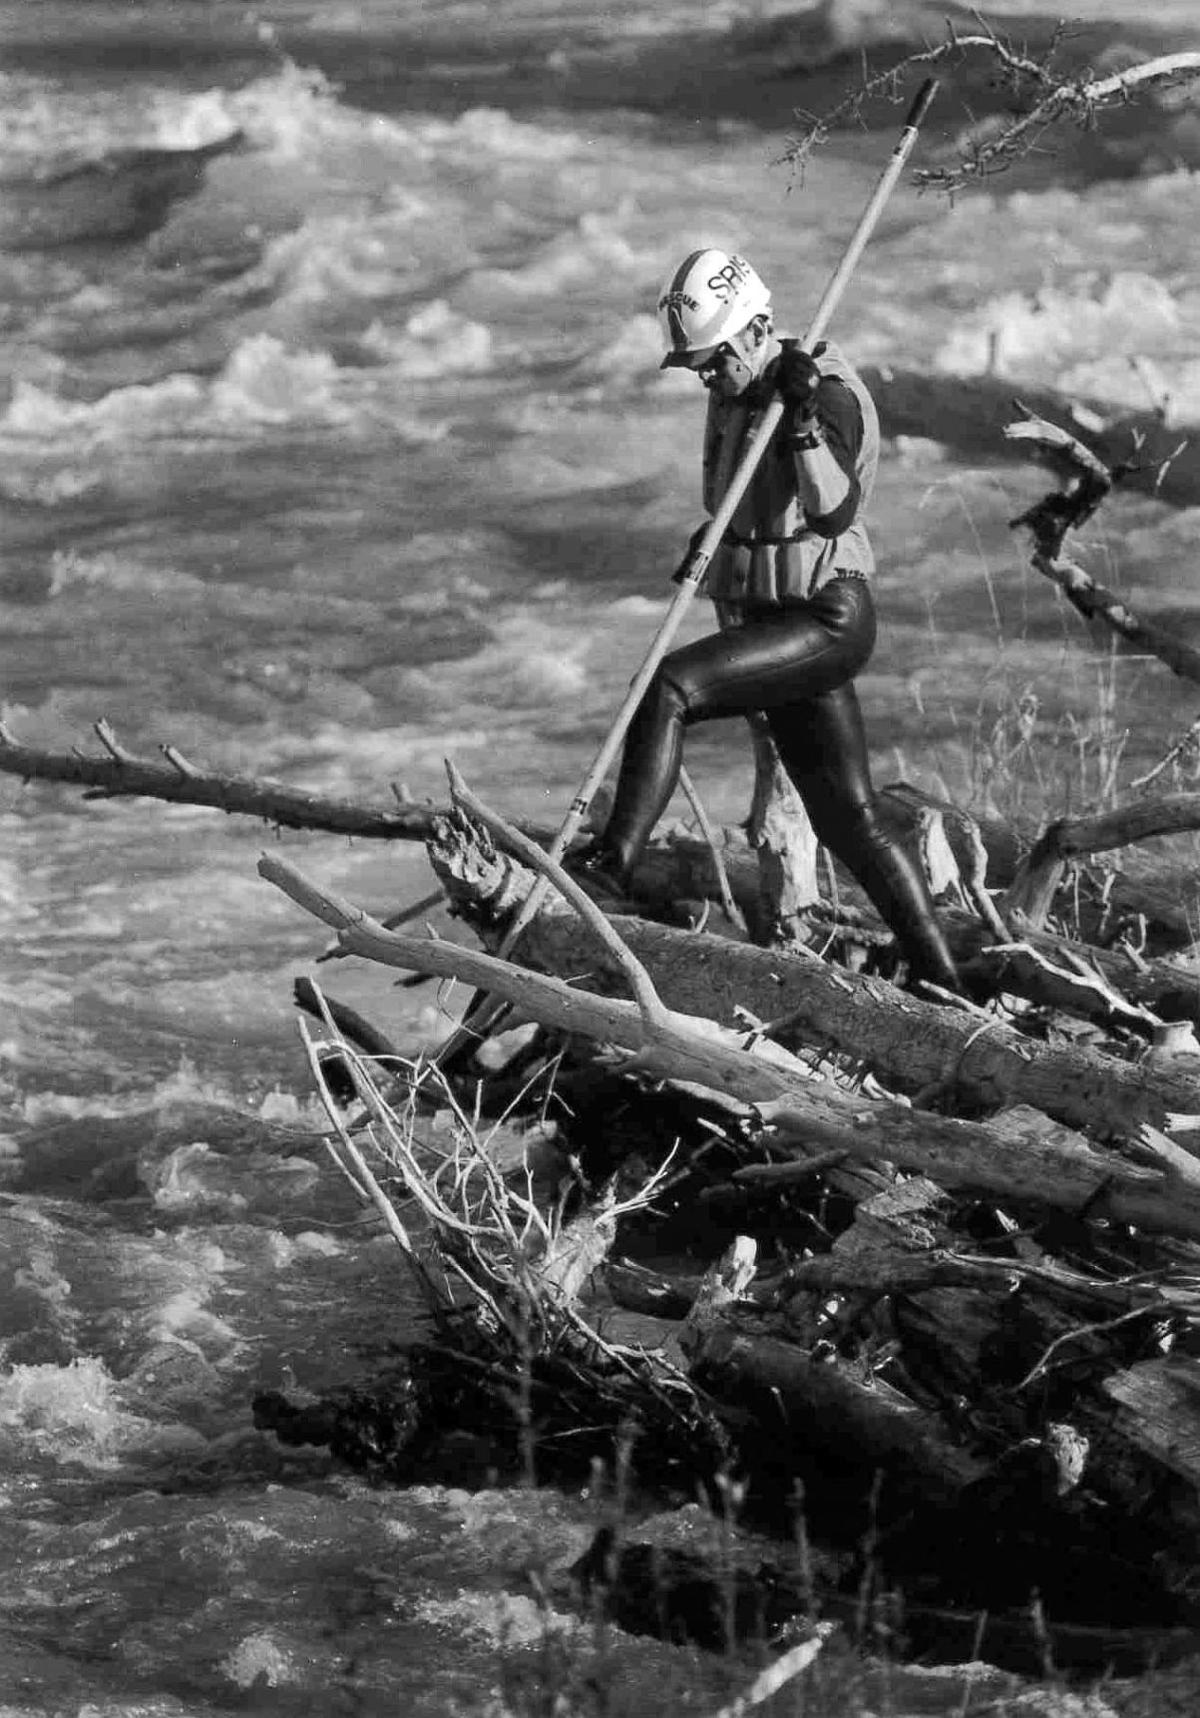 Drowned kayaker